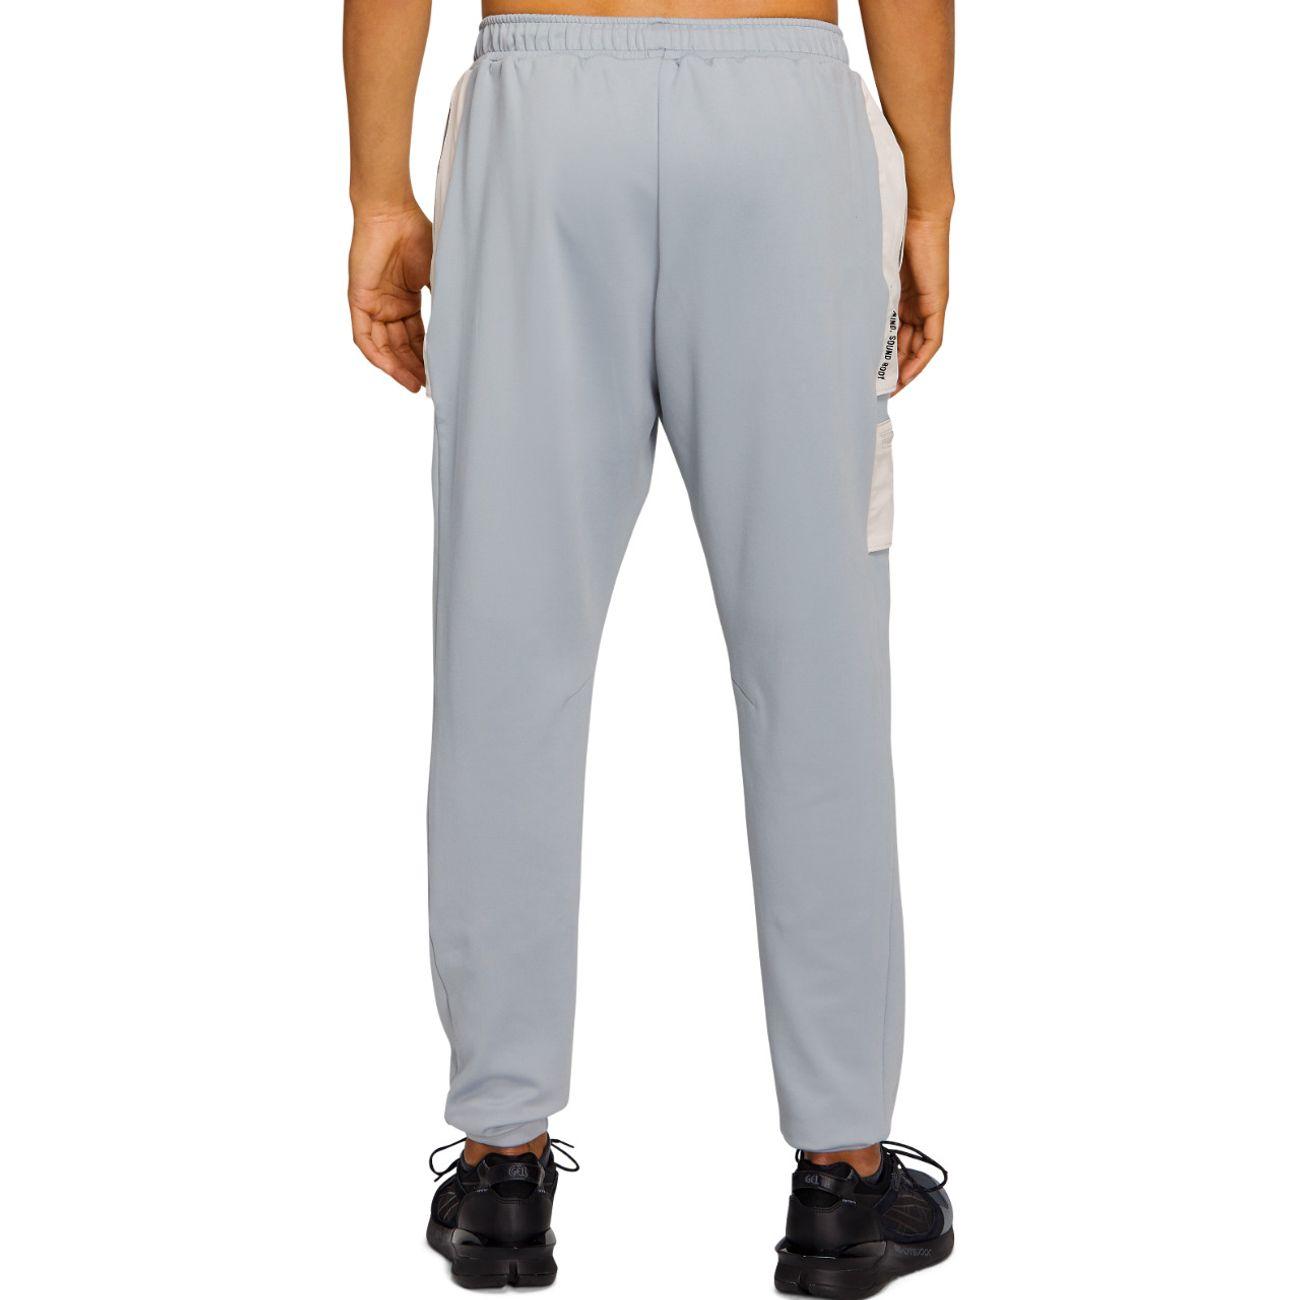 Fitness homme ASICS Pantalon Asics Thermopolis Hybrid Jogger